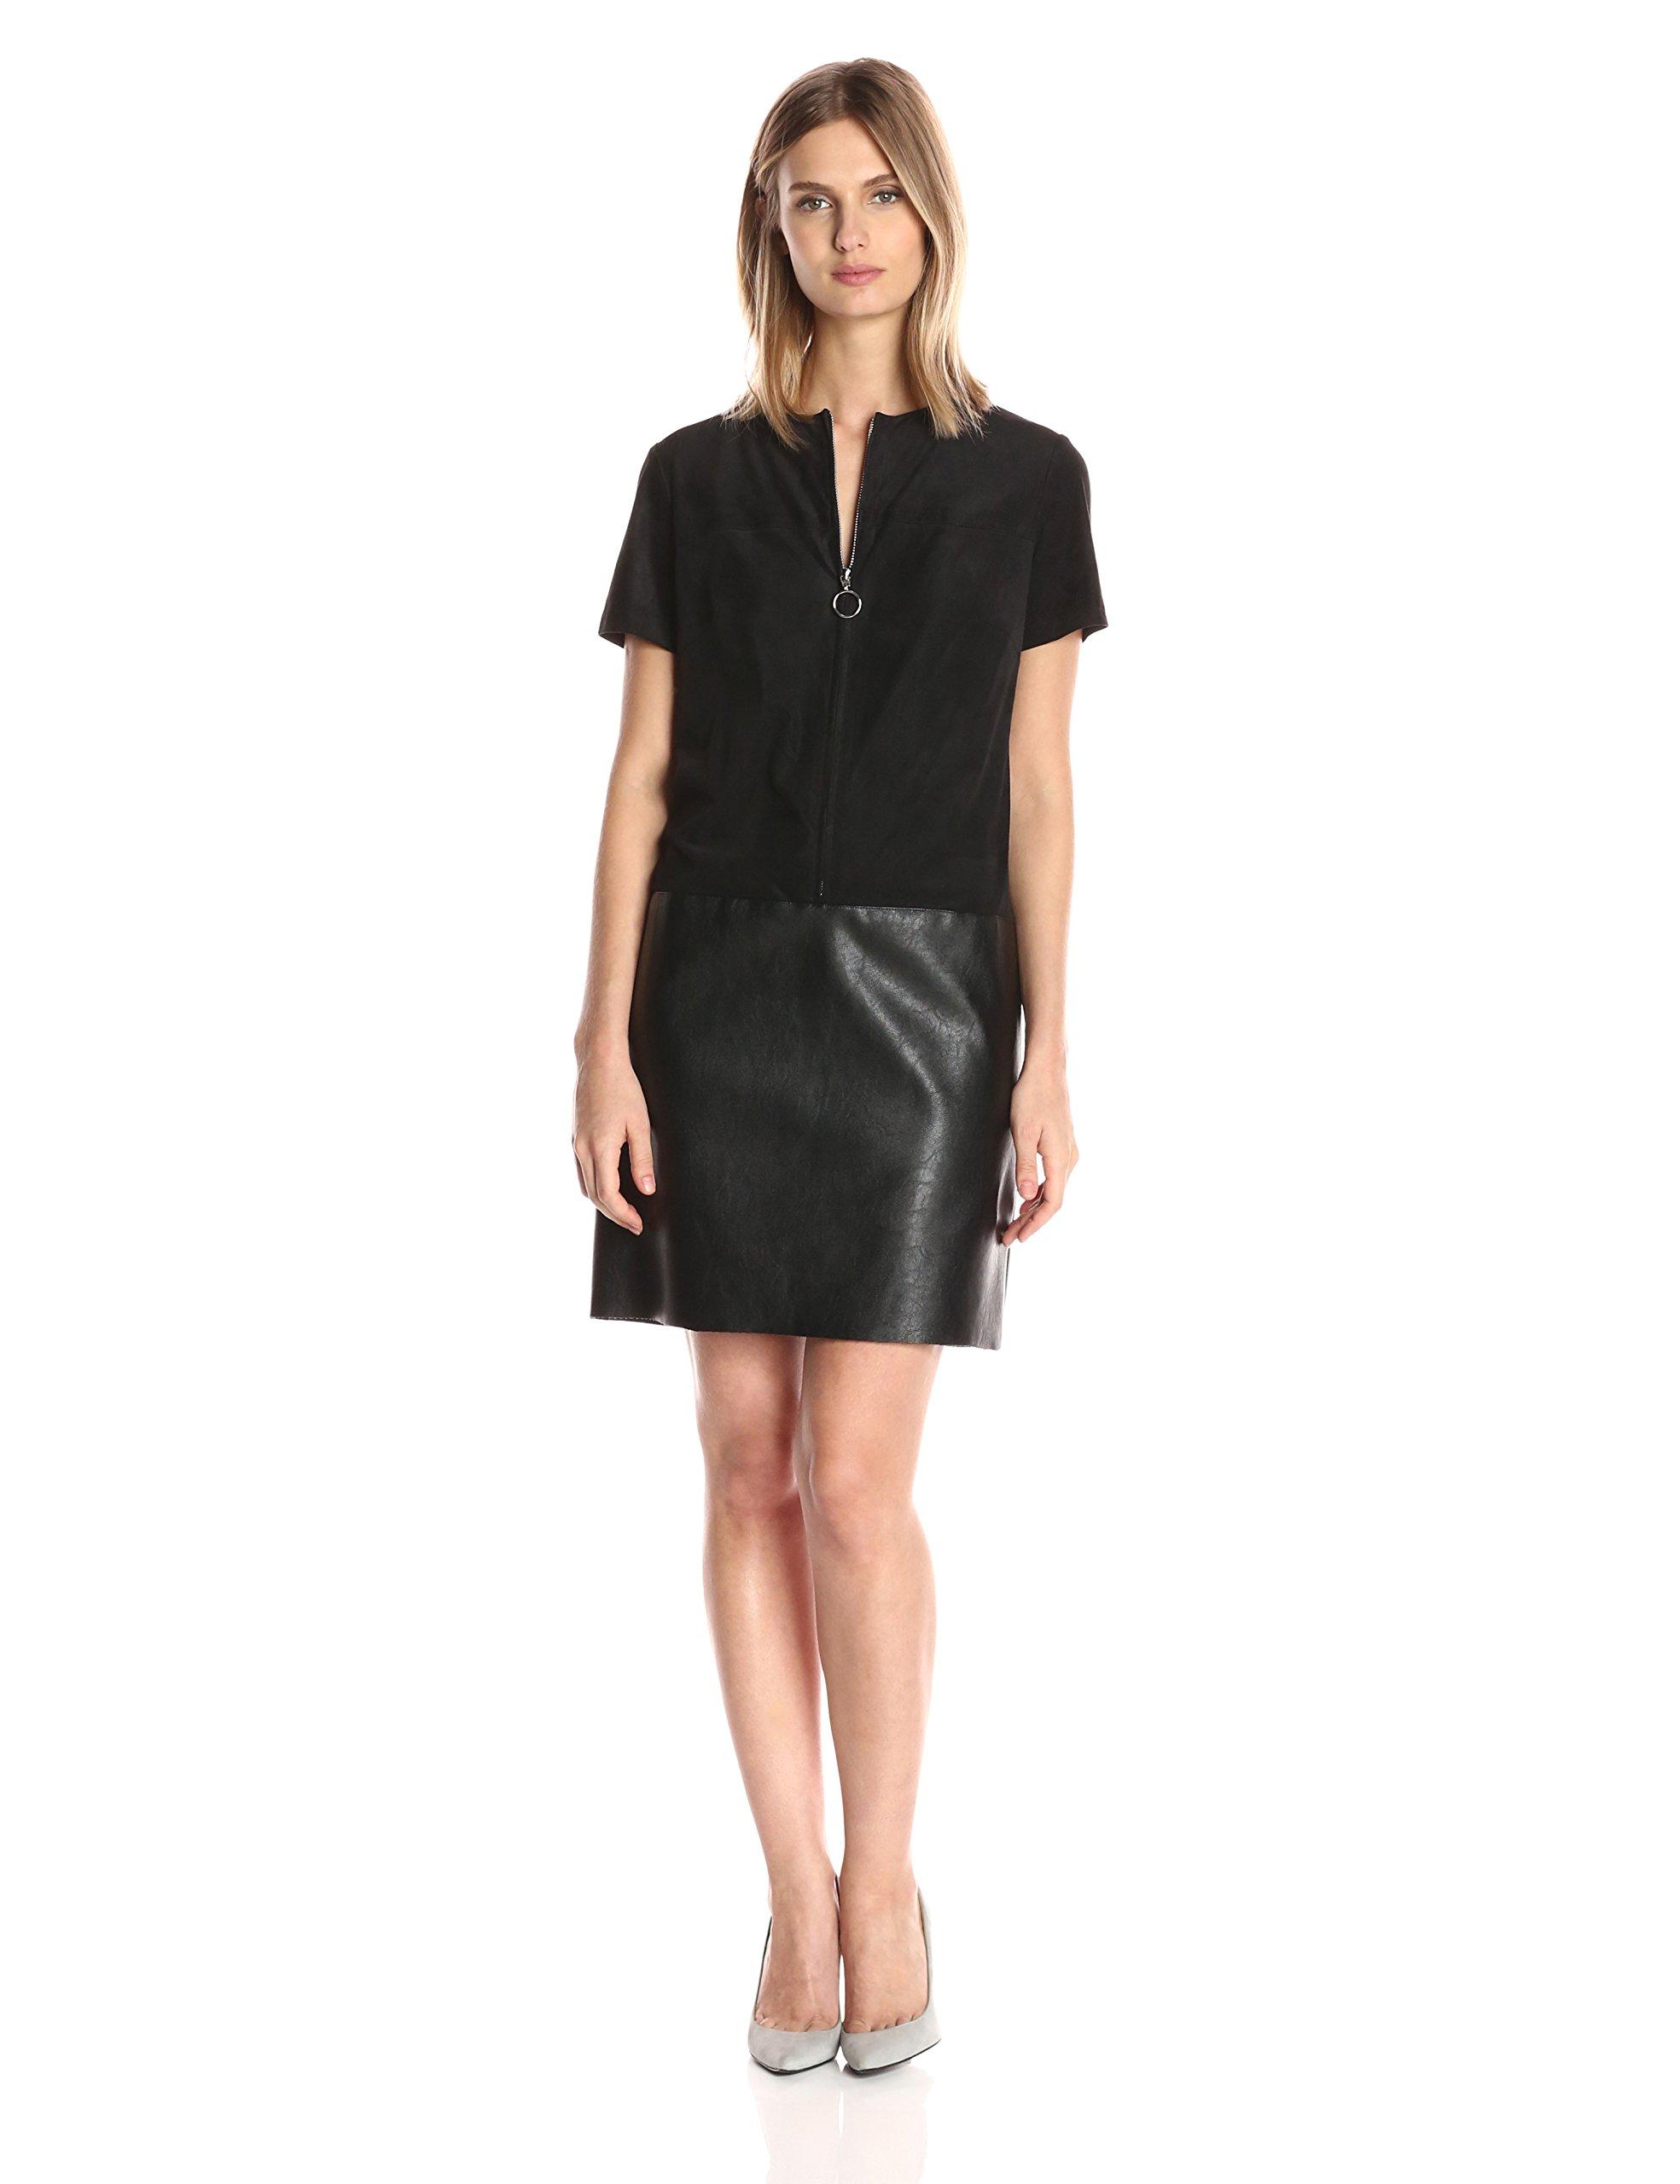 Julia Jordan Women's Short Sleeve Zip Front Faux Leather/Suede Shift Dress, Black, 10